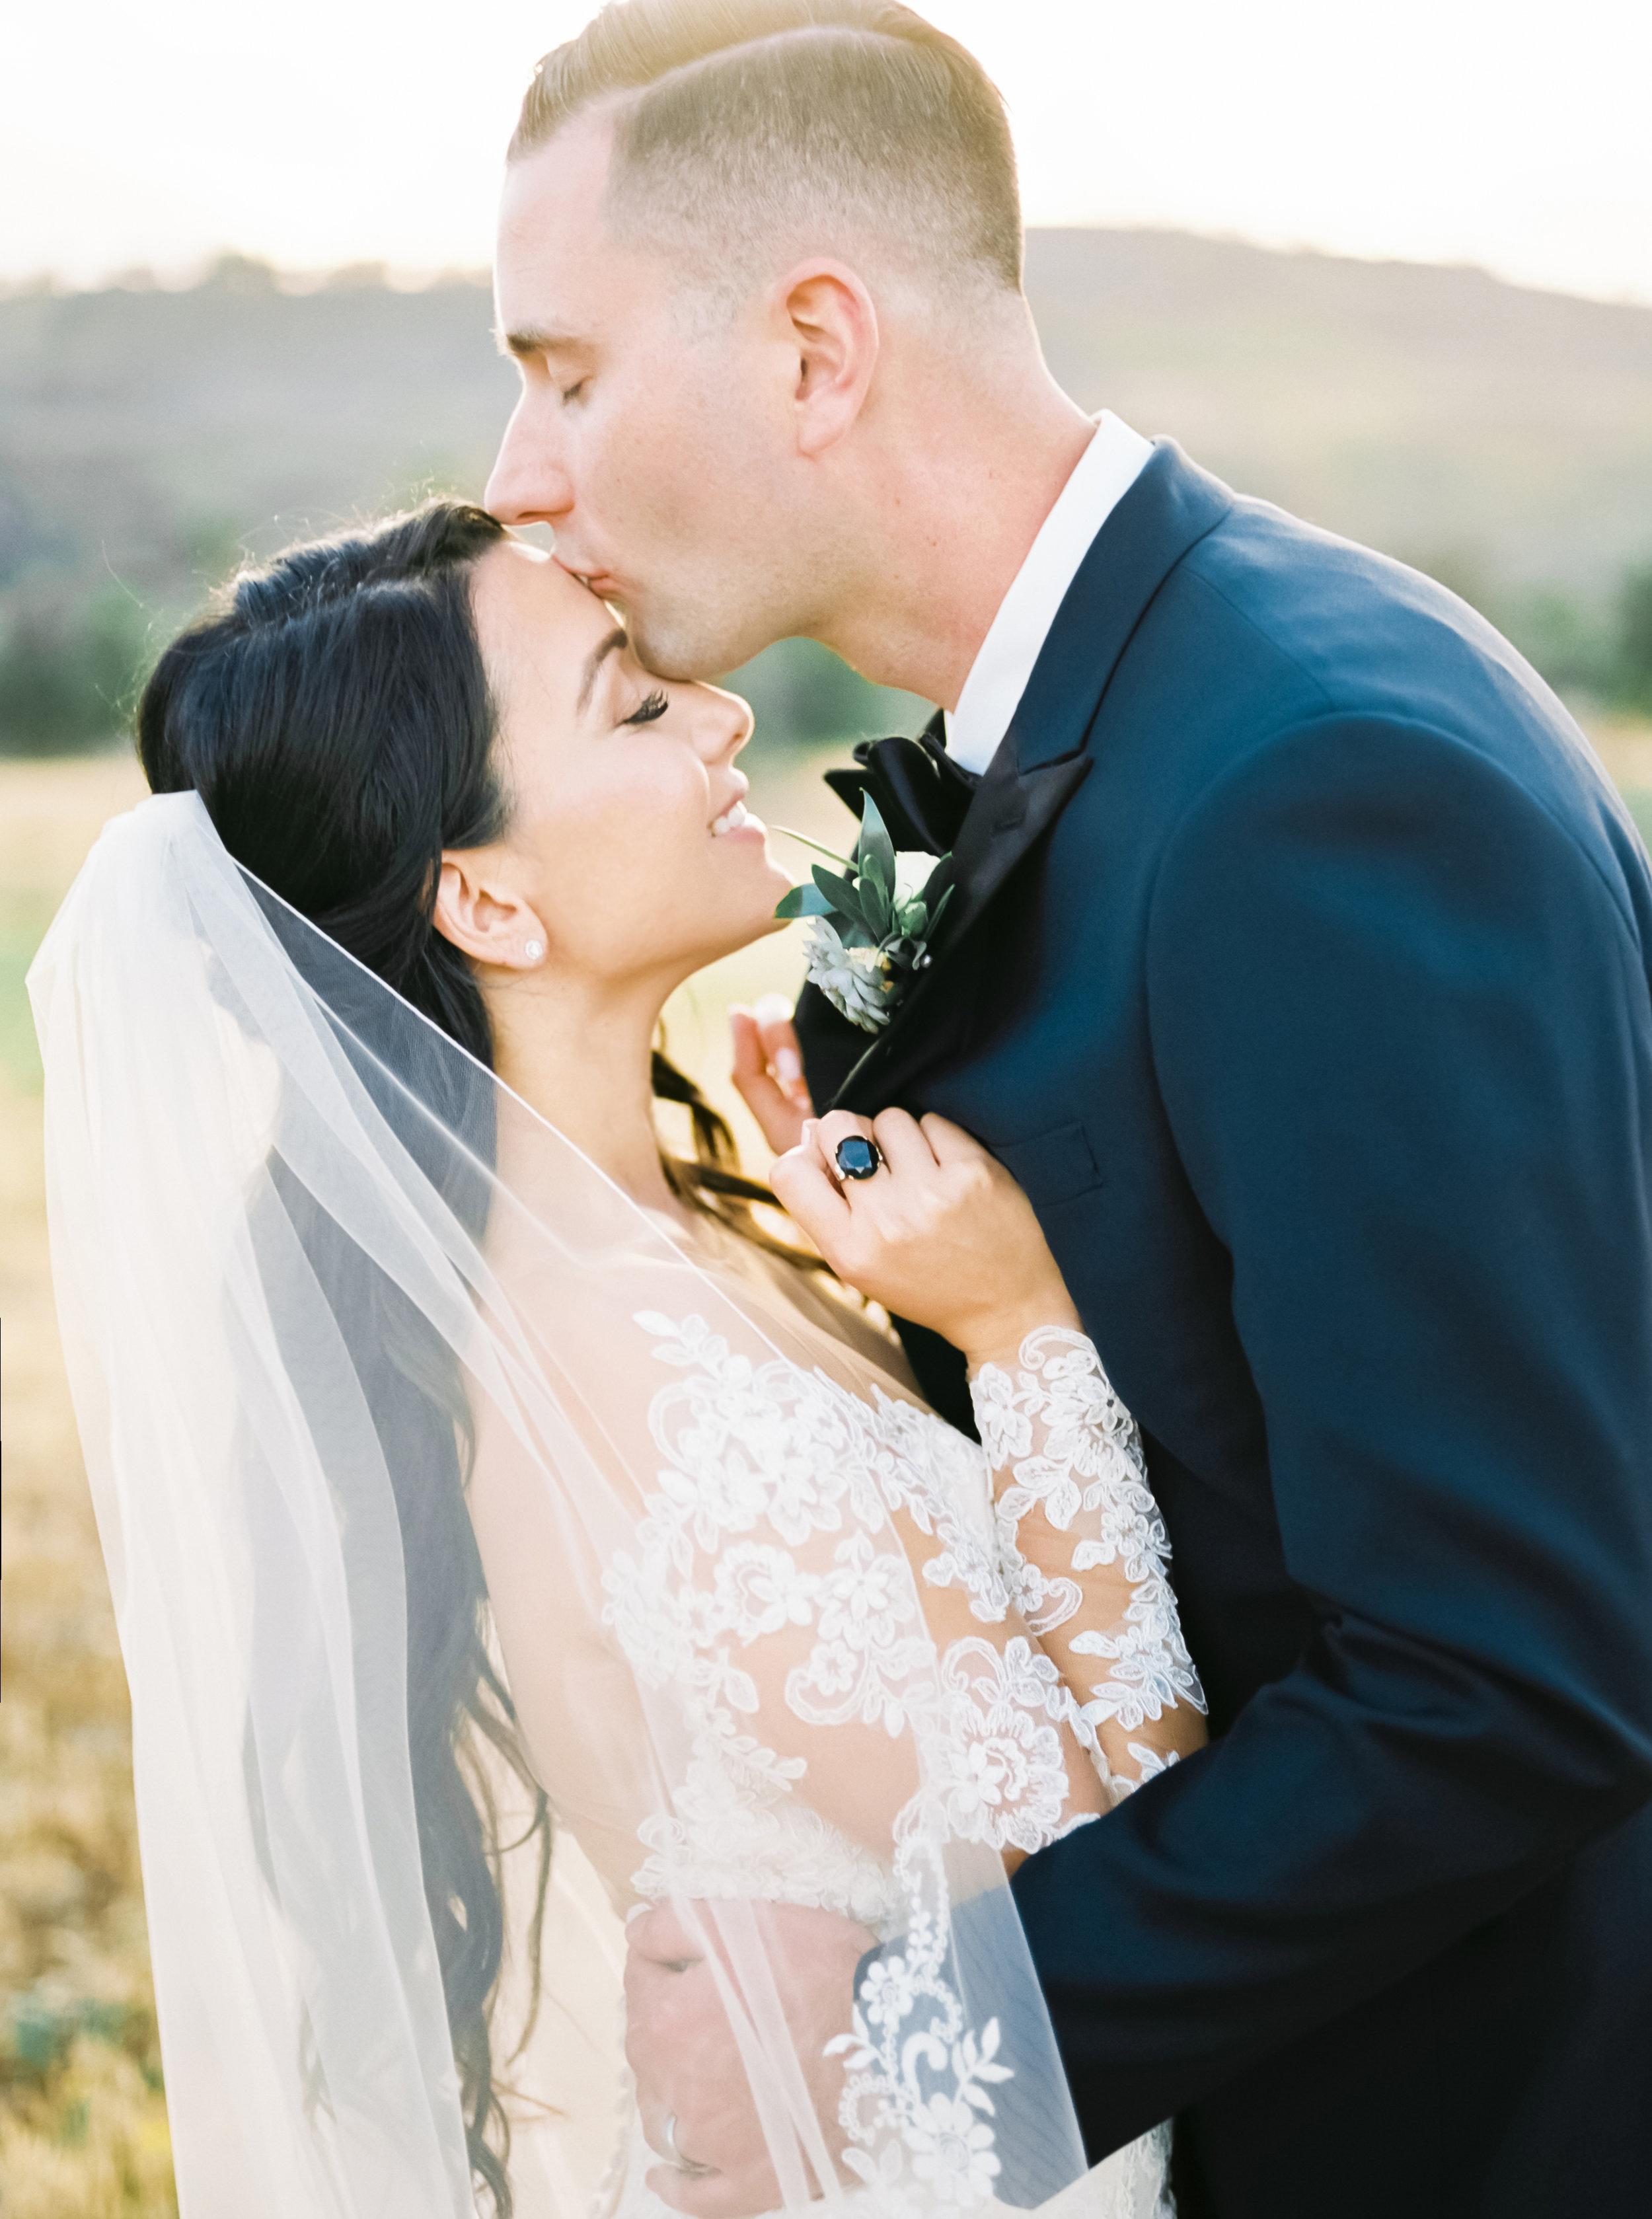 Christian & Julie's Wedding - Film-11.JPG